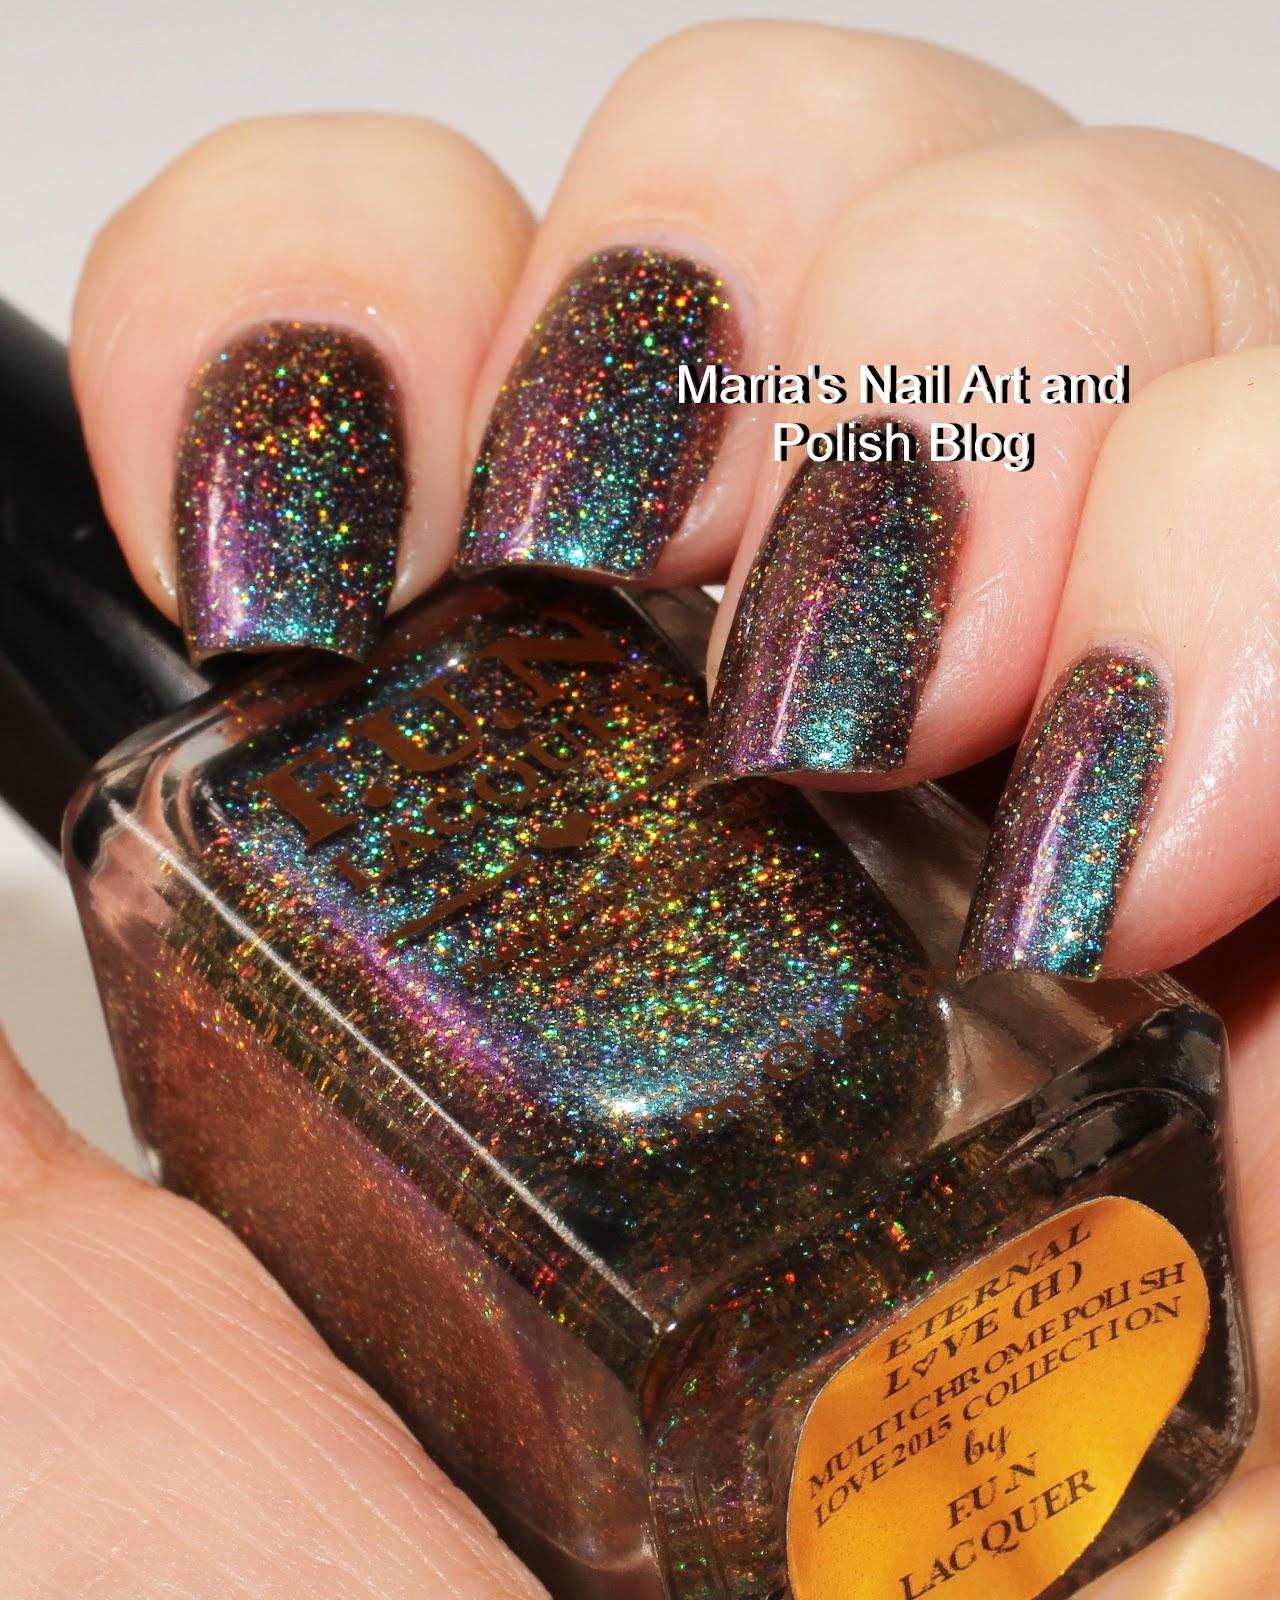 Marias Nail Art and Polish Blog: F.U.N Lacquer Eternal Love (H) swatches